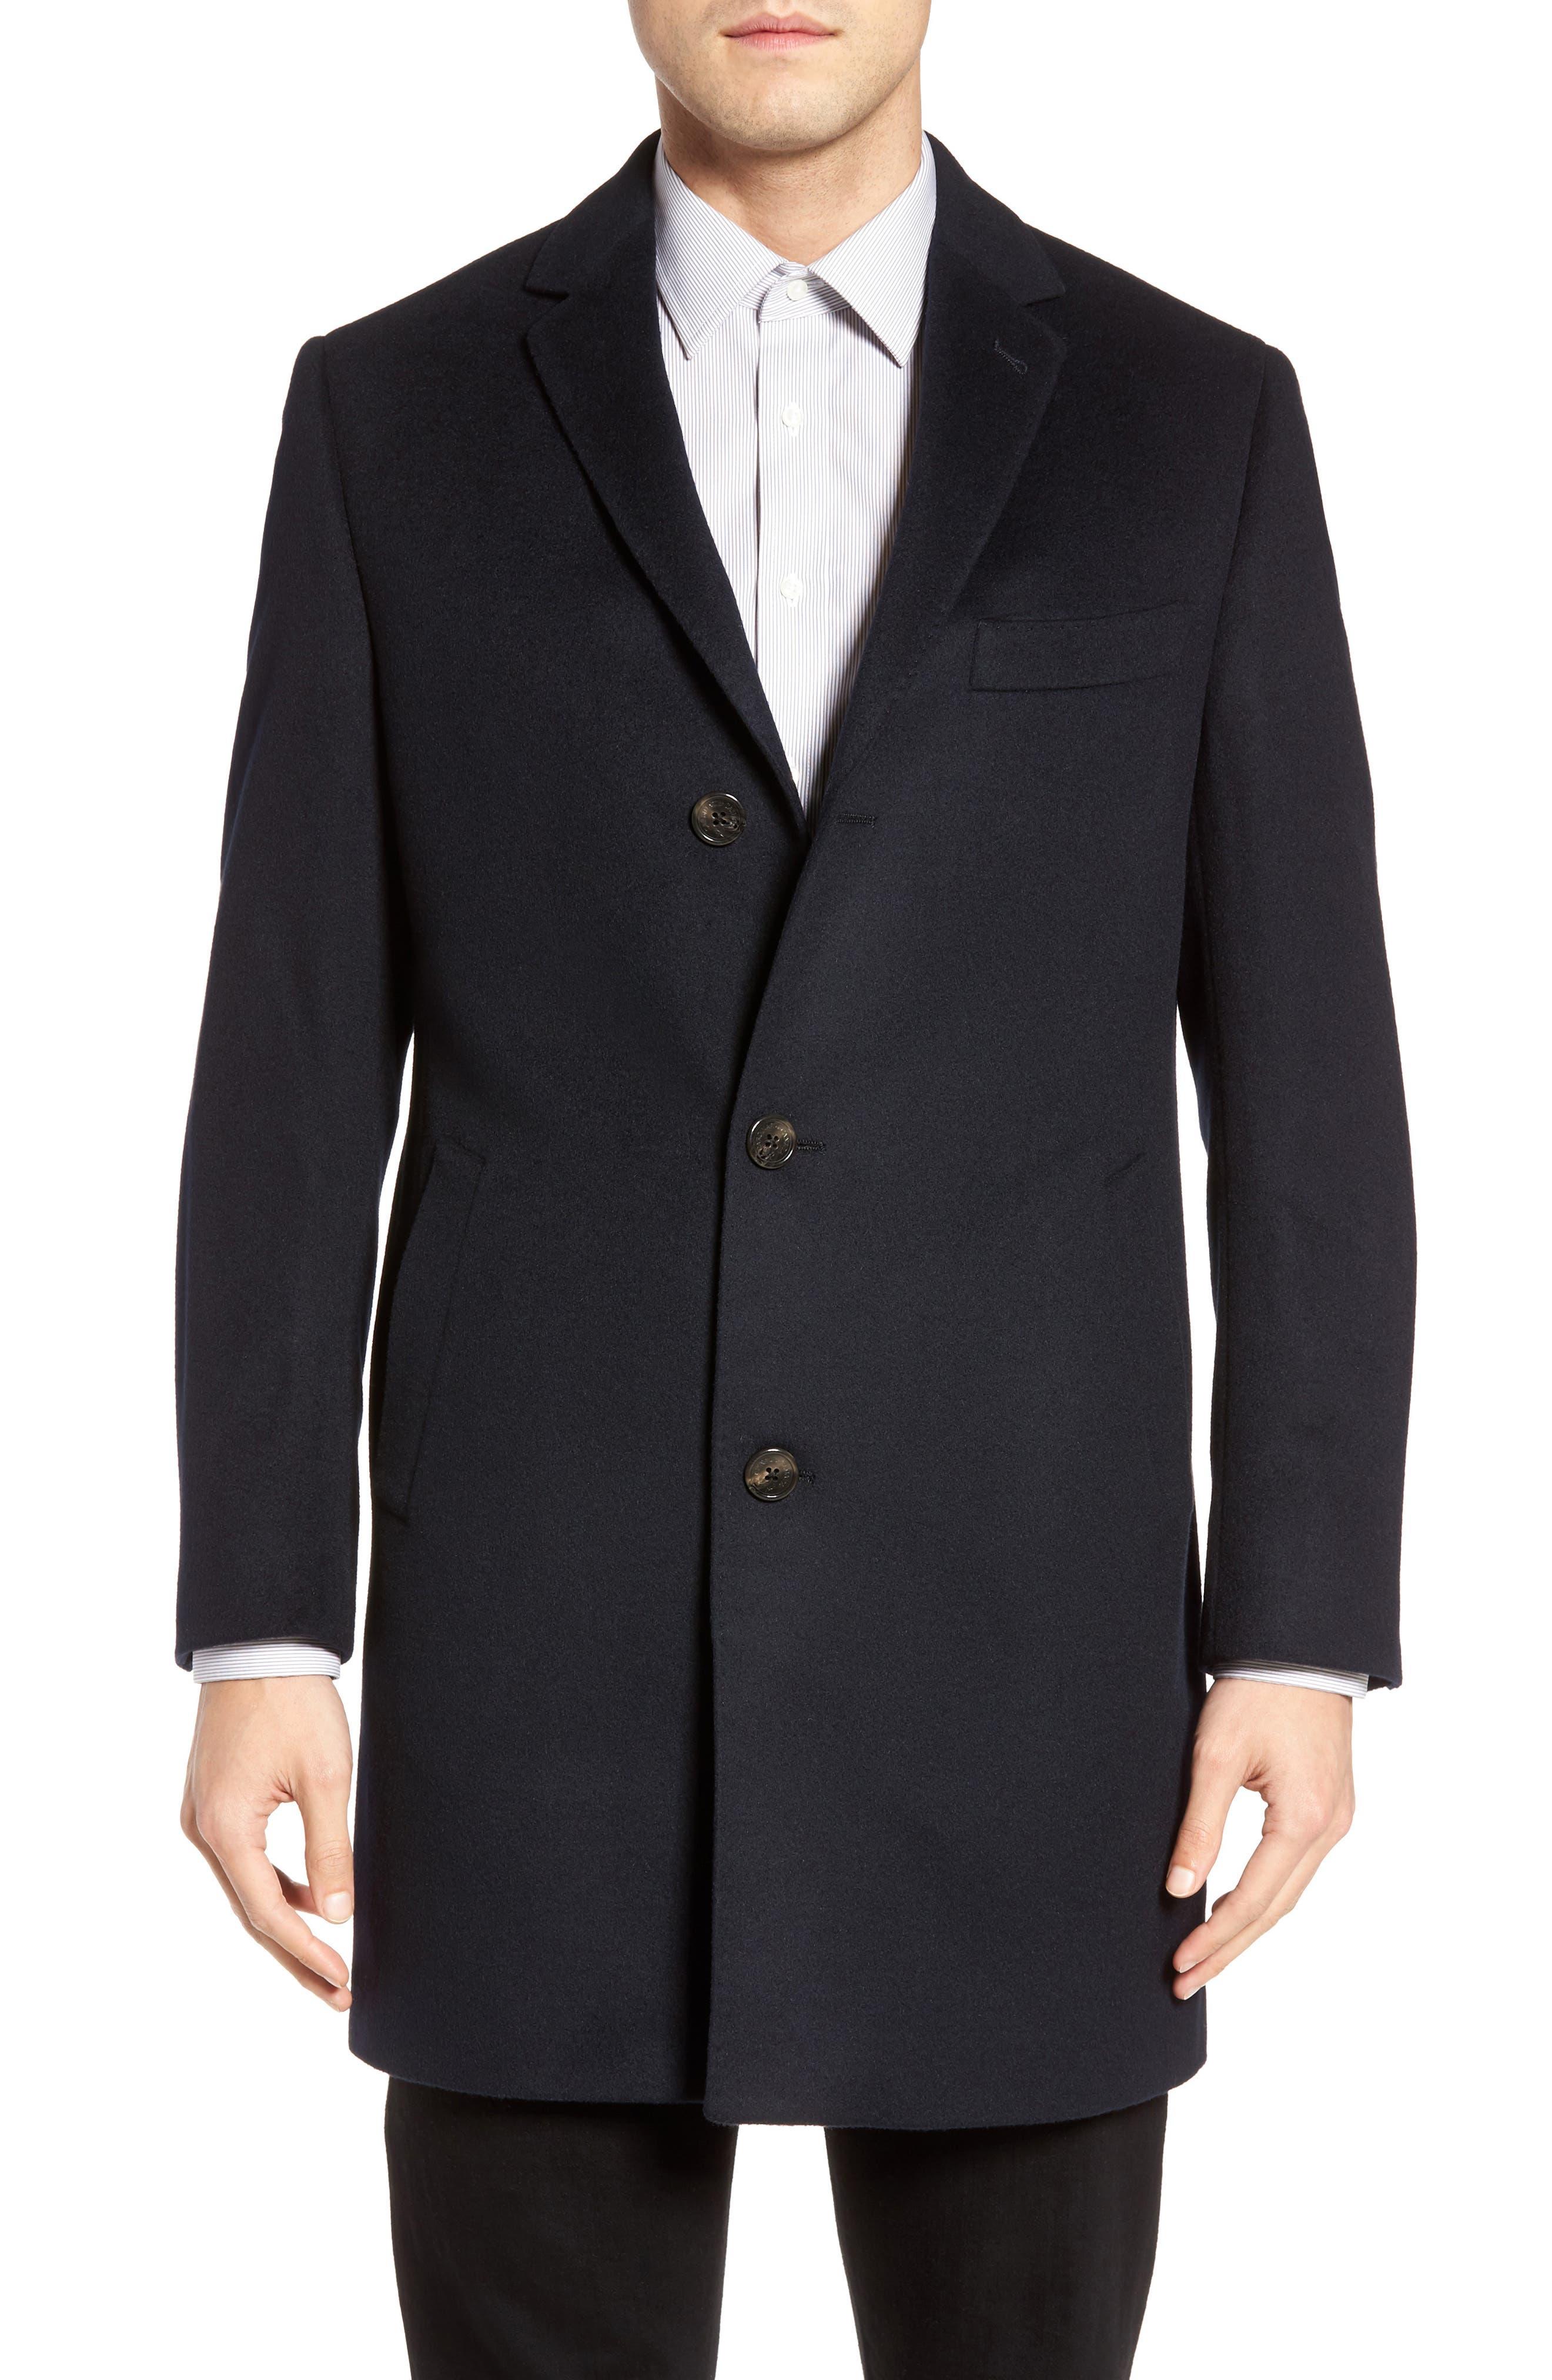 St. Paul Wool & Cashmere Topcoat,                             Main thumbnail 1, color,                             410